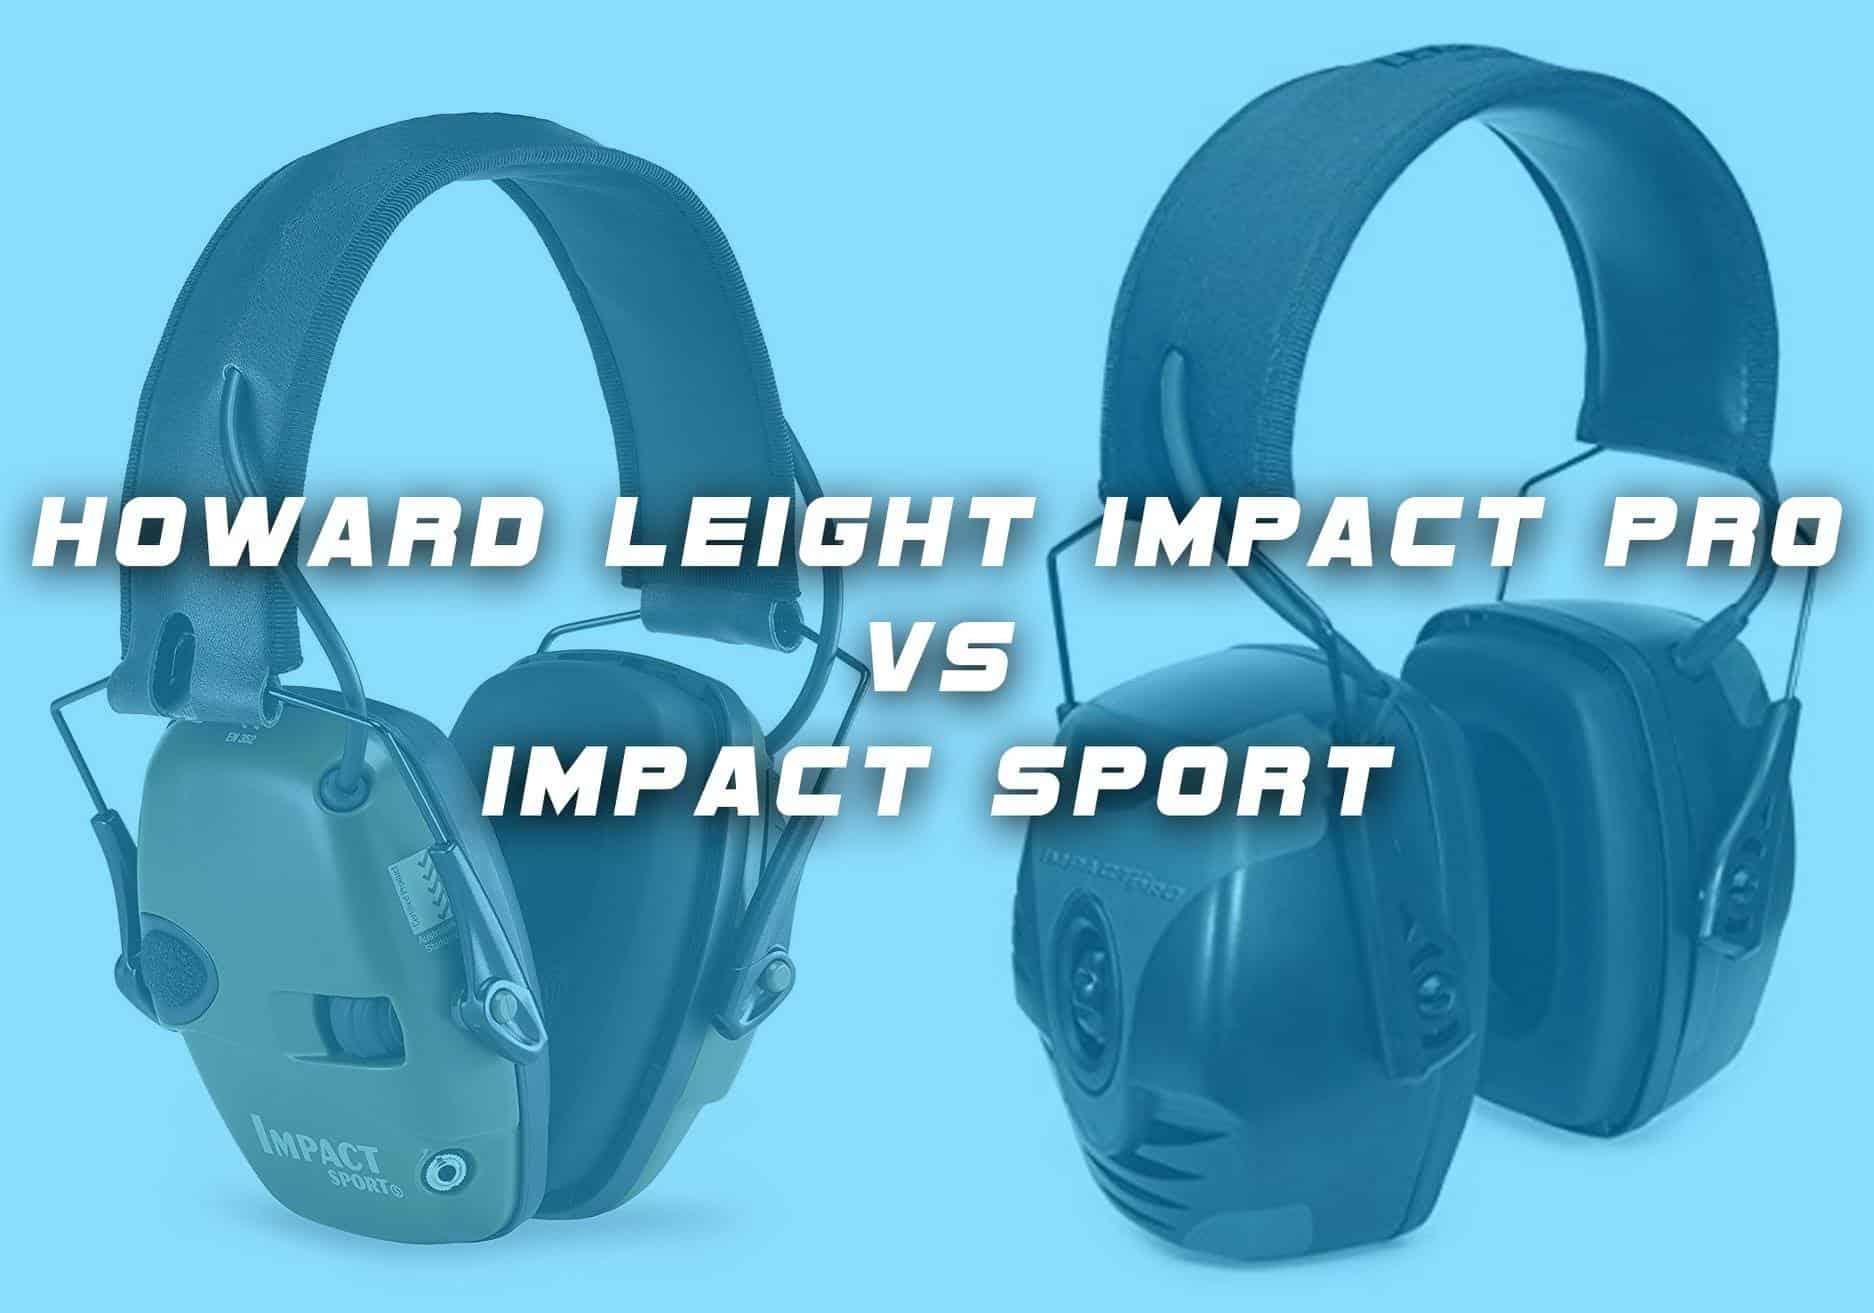 Howard Leight Impact Pro VS Impact Sport